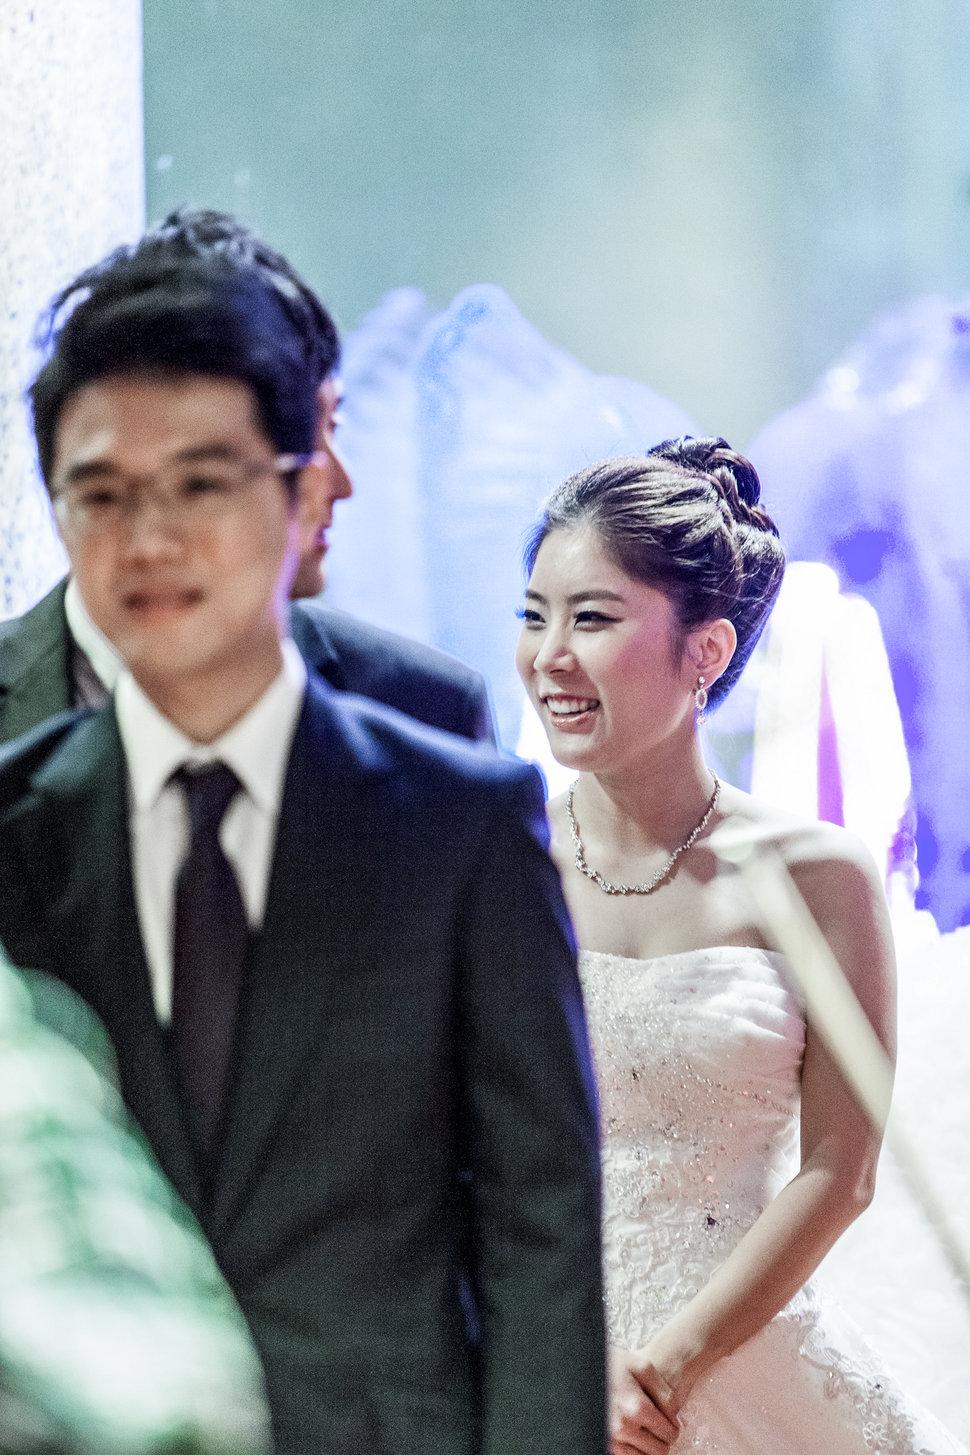 0011 - HS 婚禮攝影平面紀錄《結婚吧》